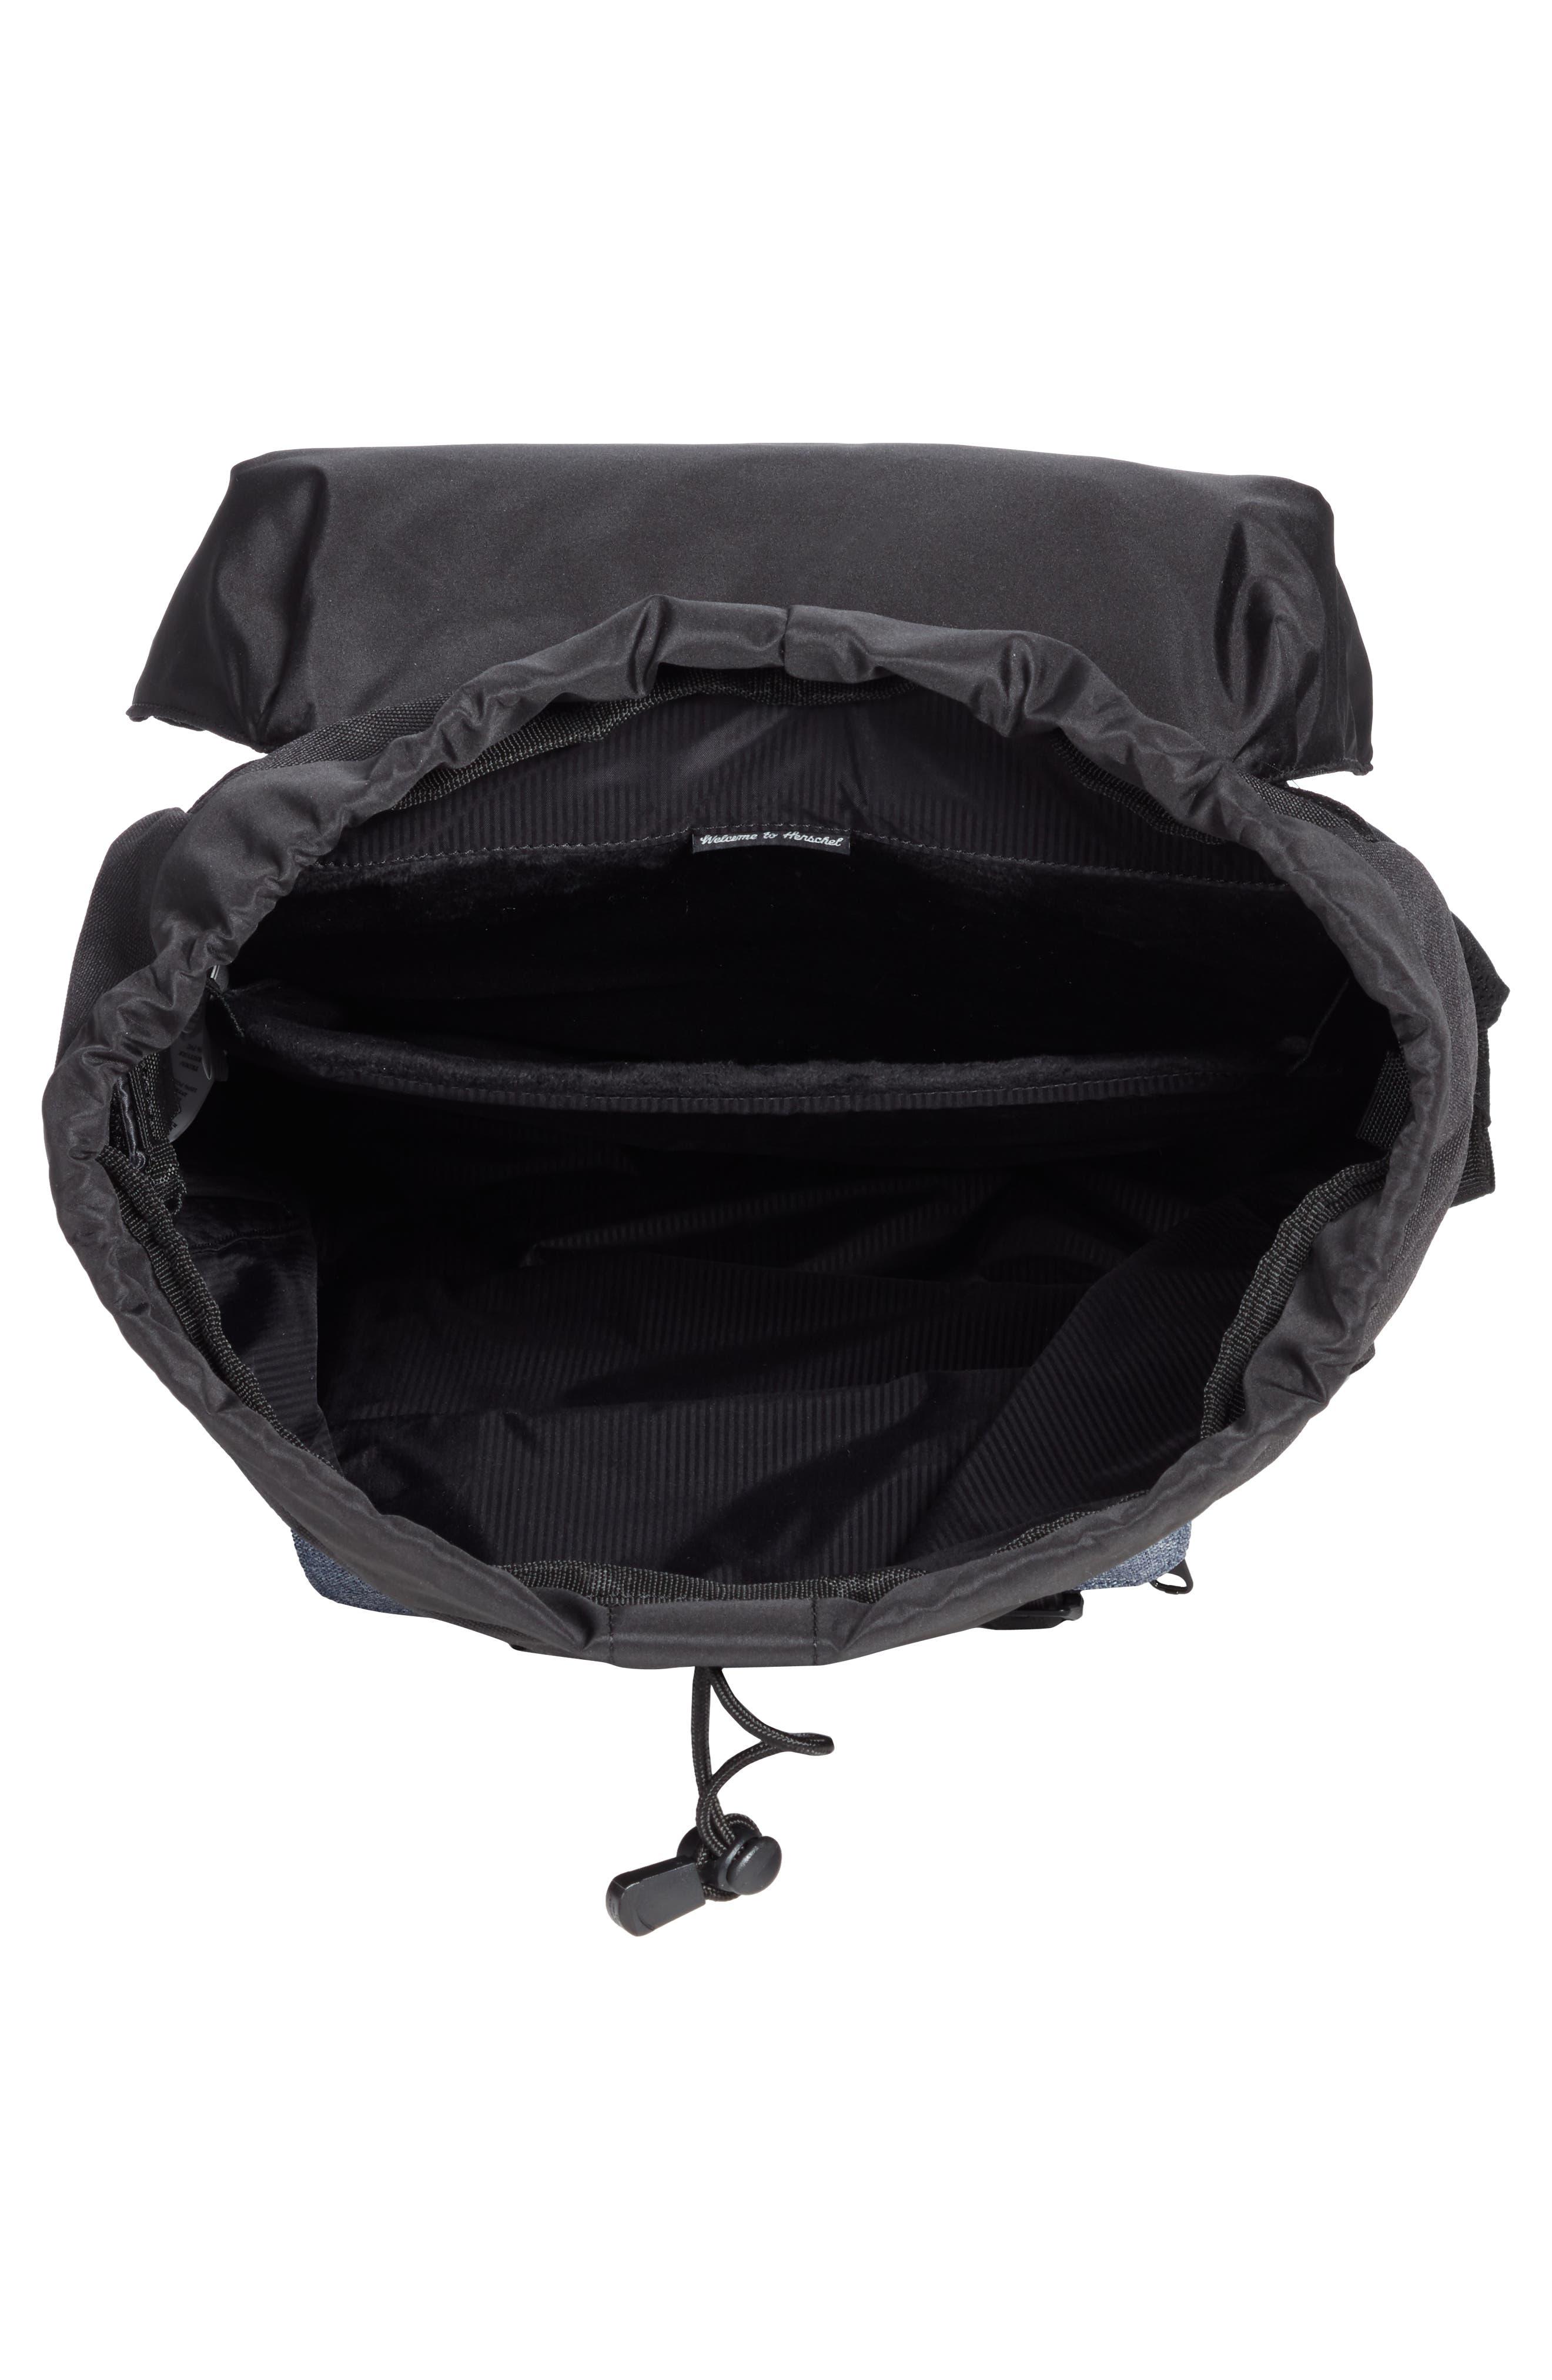 Little America - Chambray Backpack,                             Alternate thumbnail 4, color,                             Black/ Dark Chambray